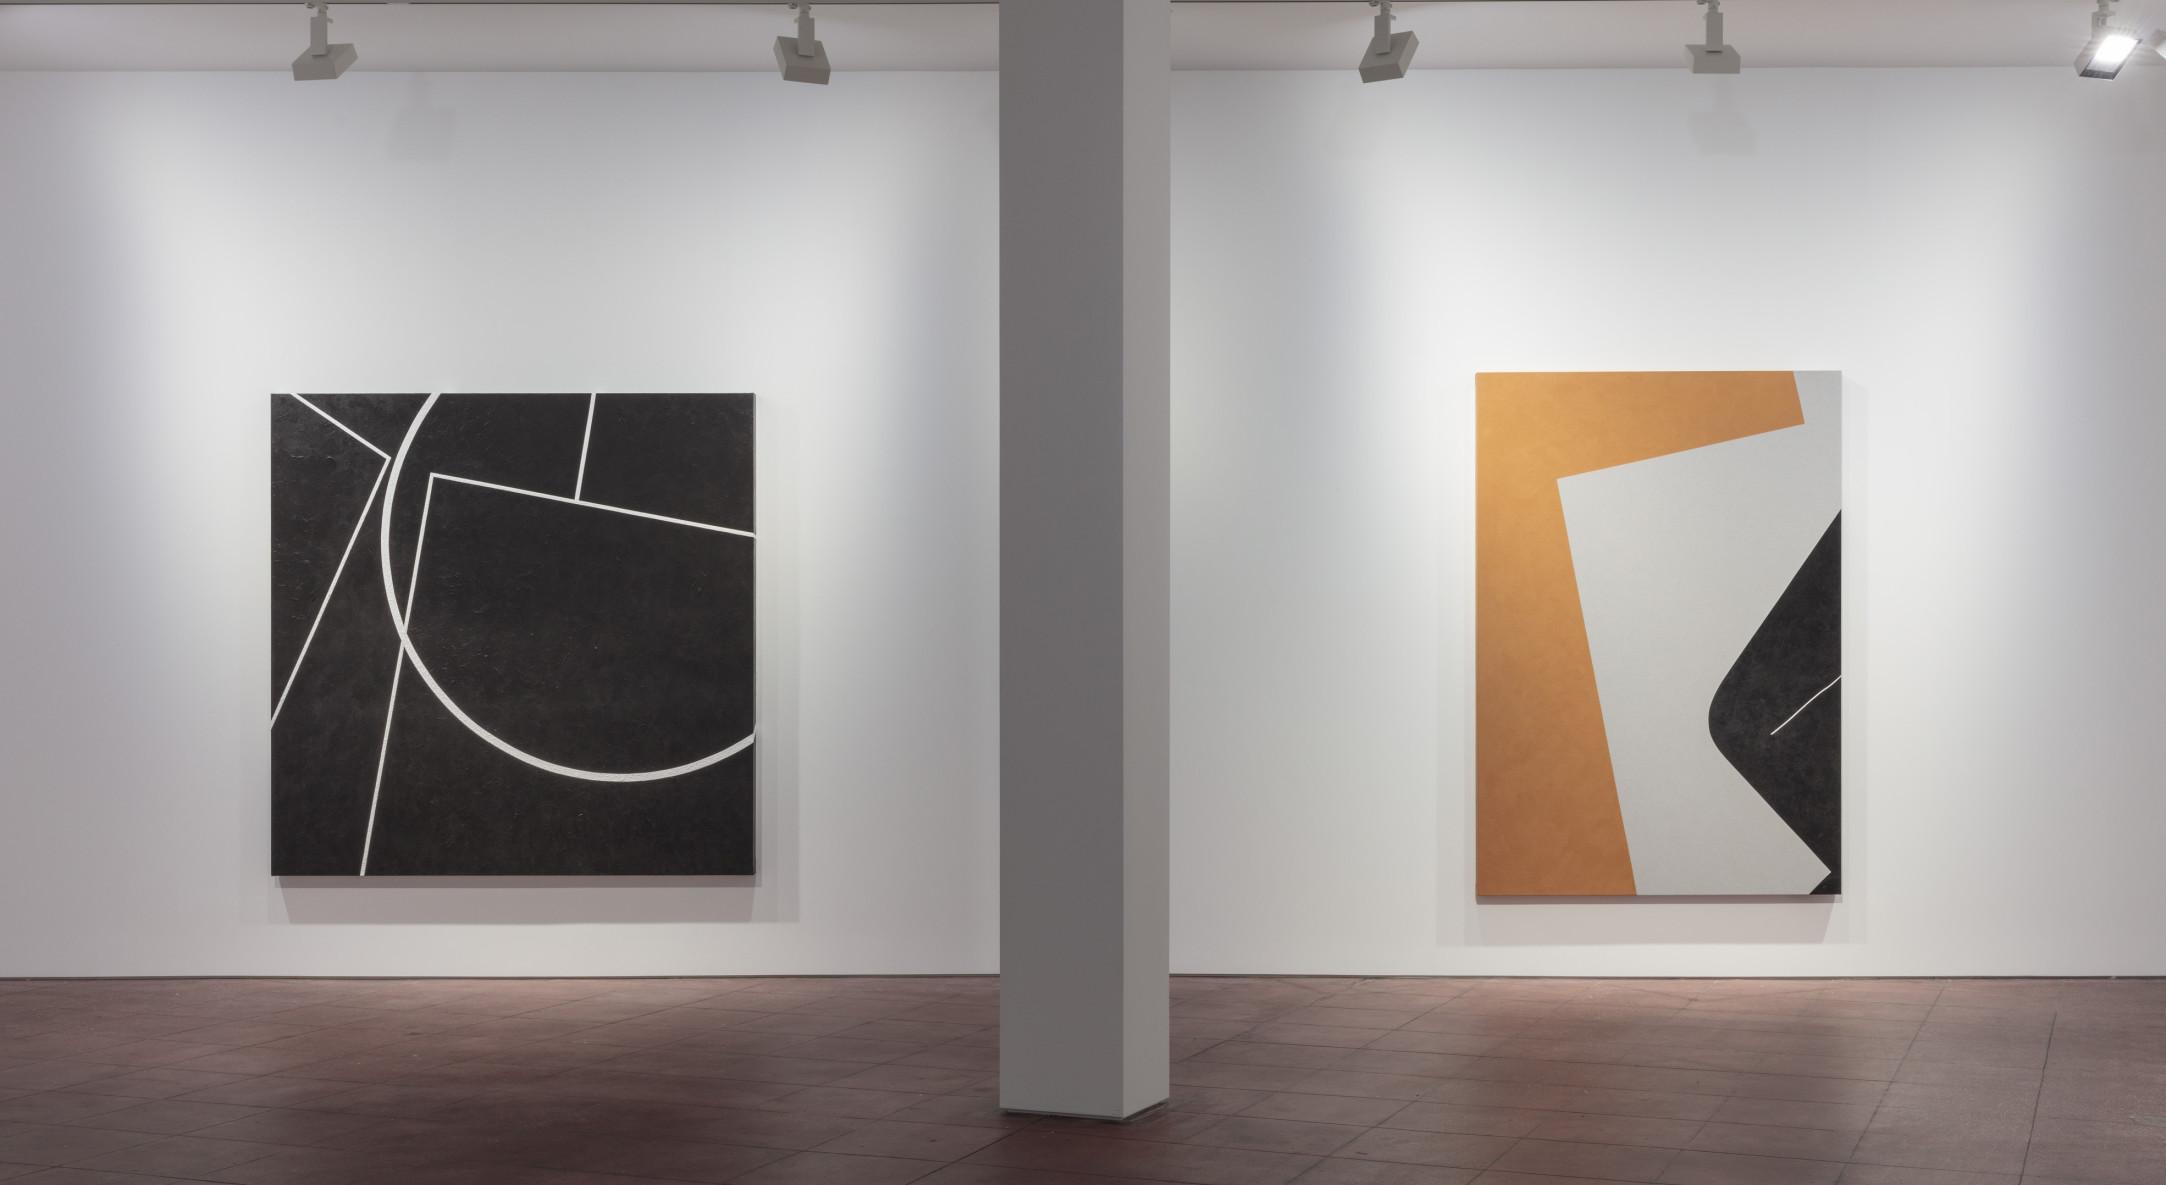 Installation view of Virginia Jaramillo, Foundations at Hales New York